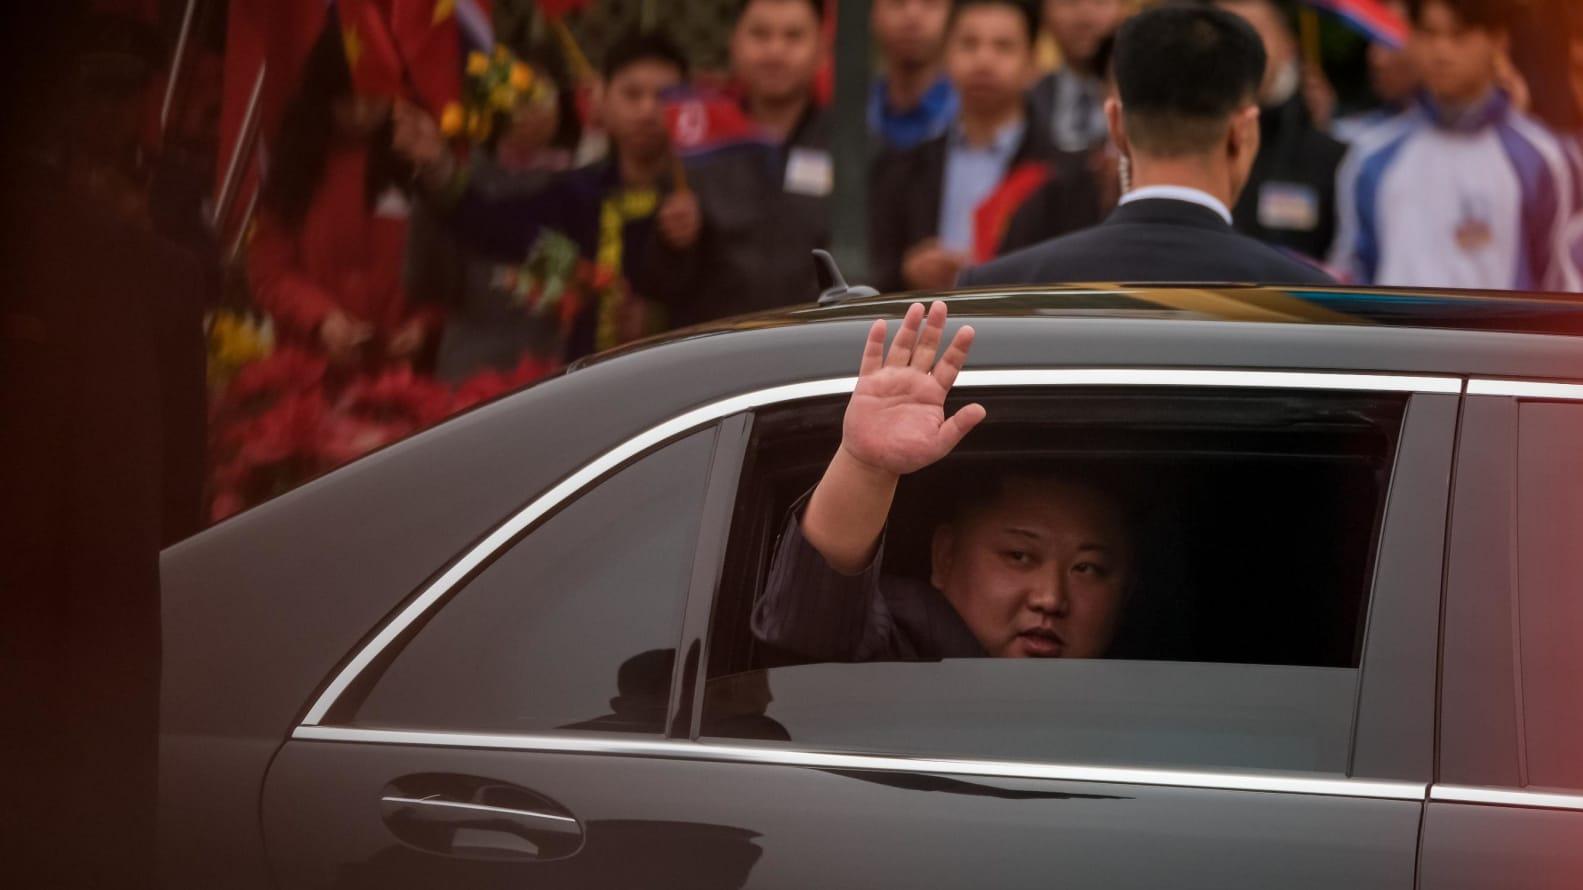 Kim Jong Un in Mercedes